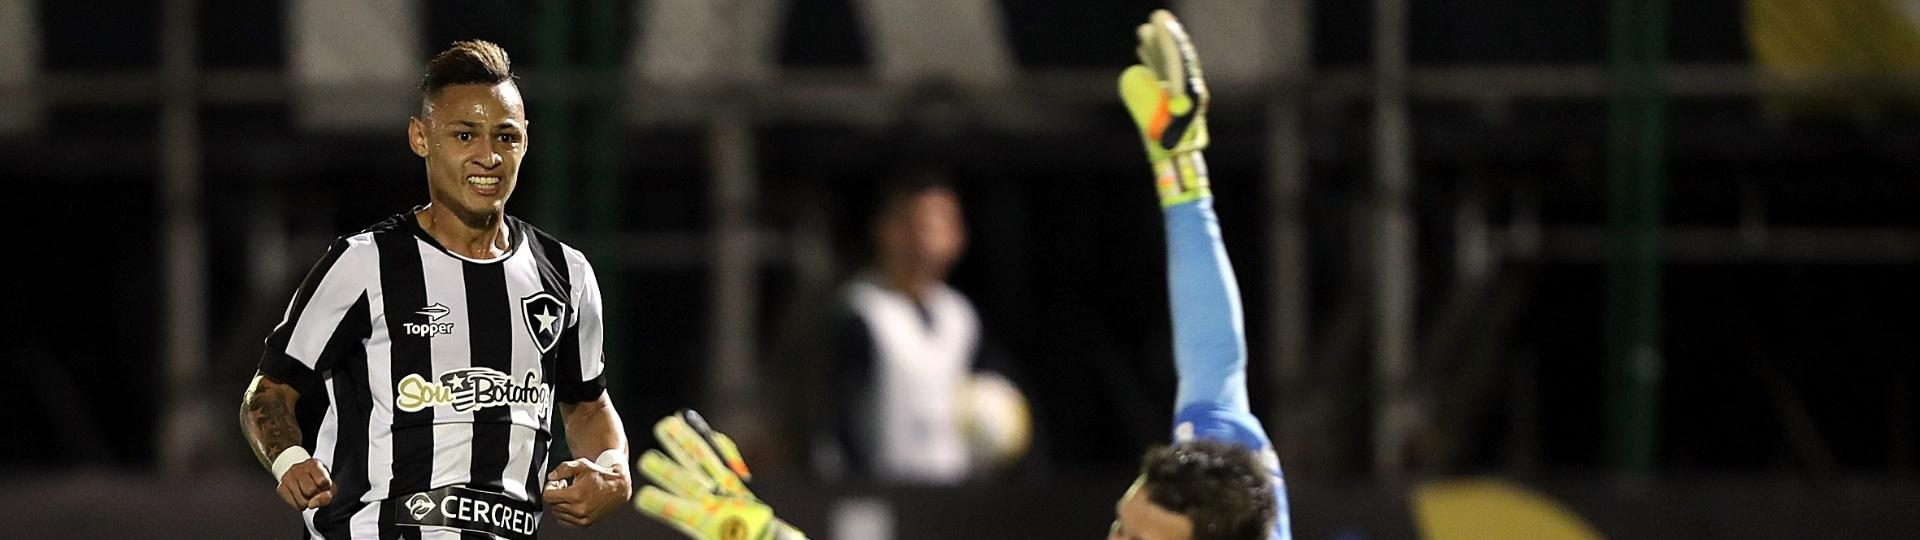 Neílton supera o goleiro do Palmeiras e marca para o Botafogo